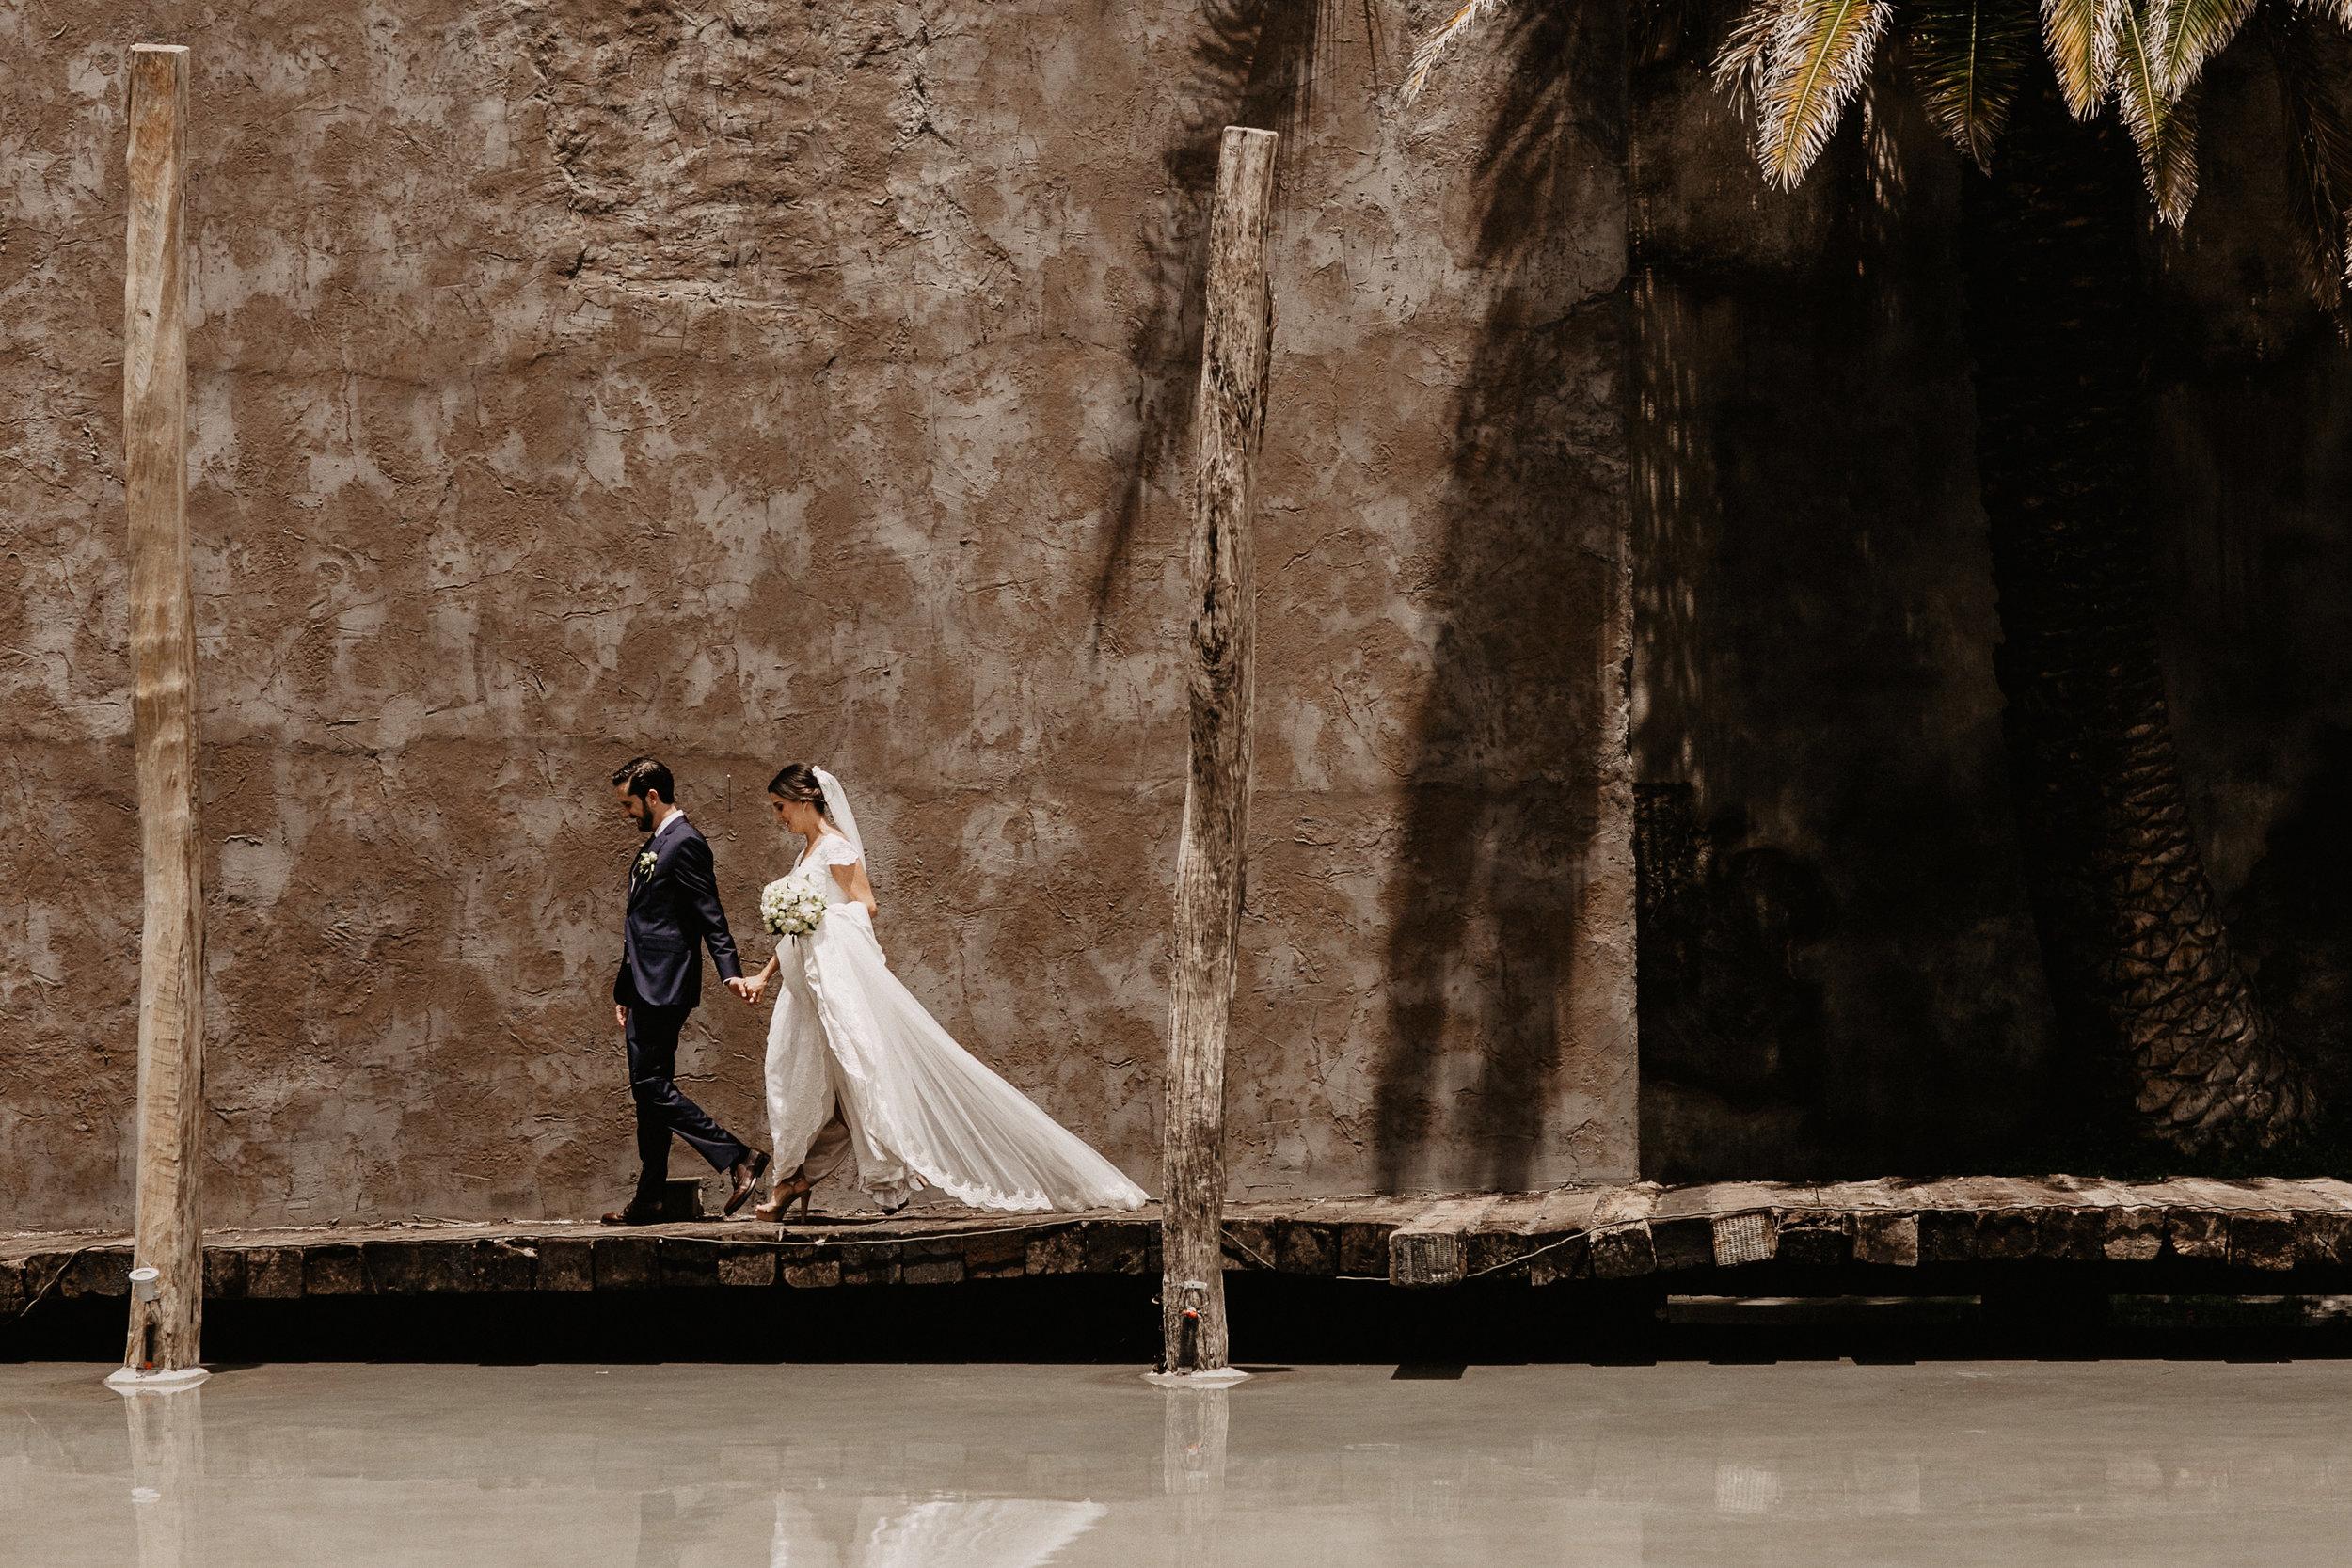 alfonso_flores_destination_wedding_photographer_pau_alonso_255.JPG